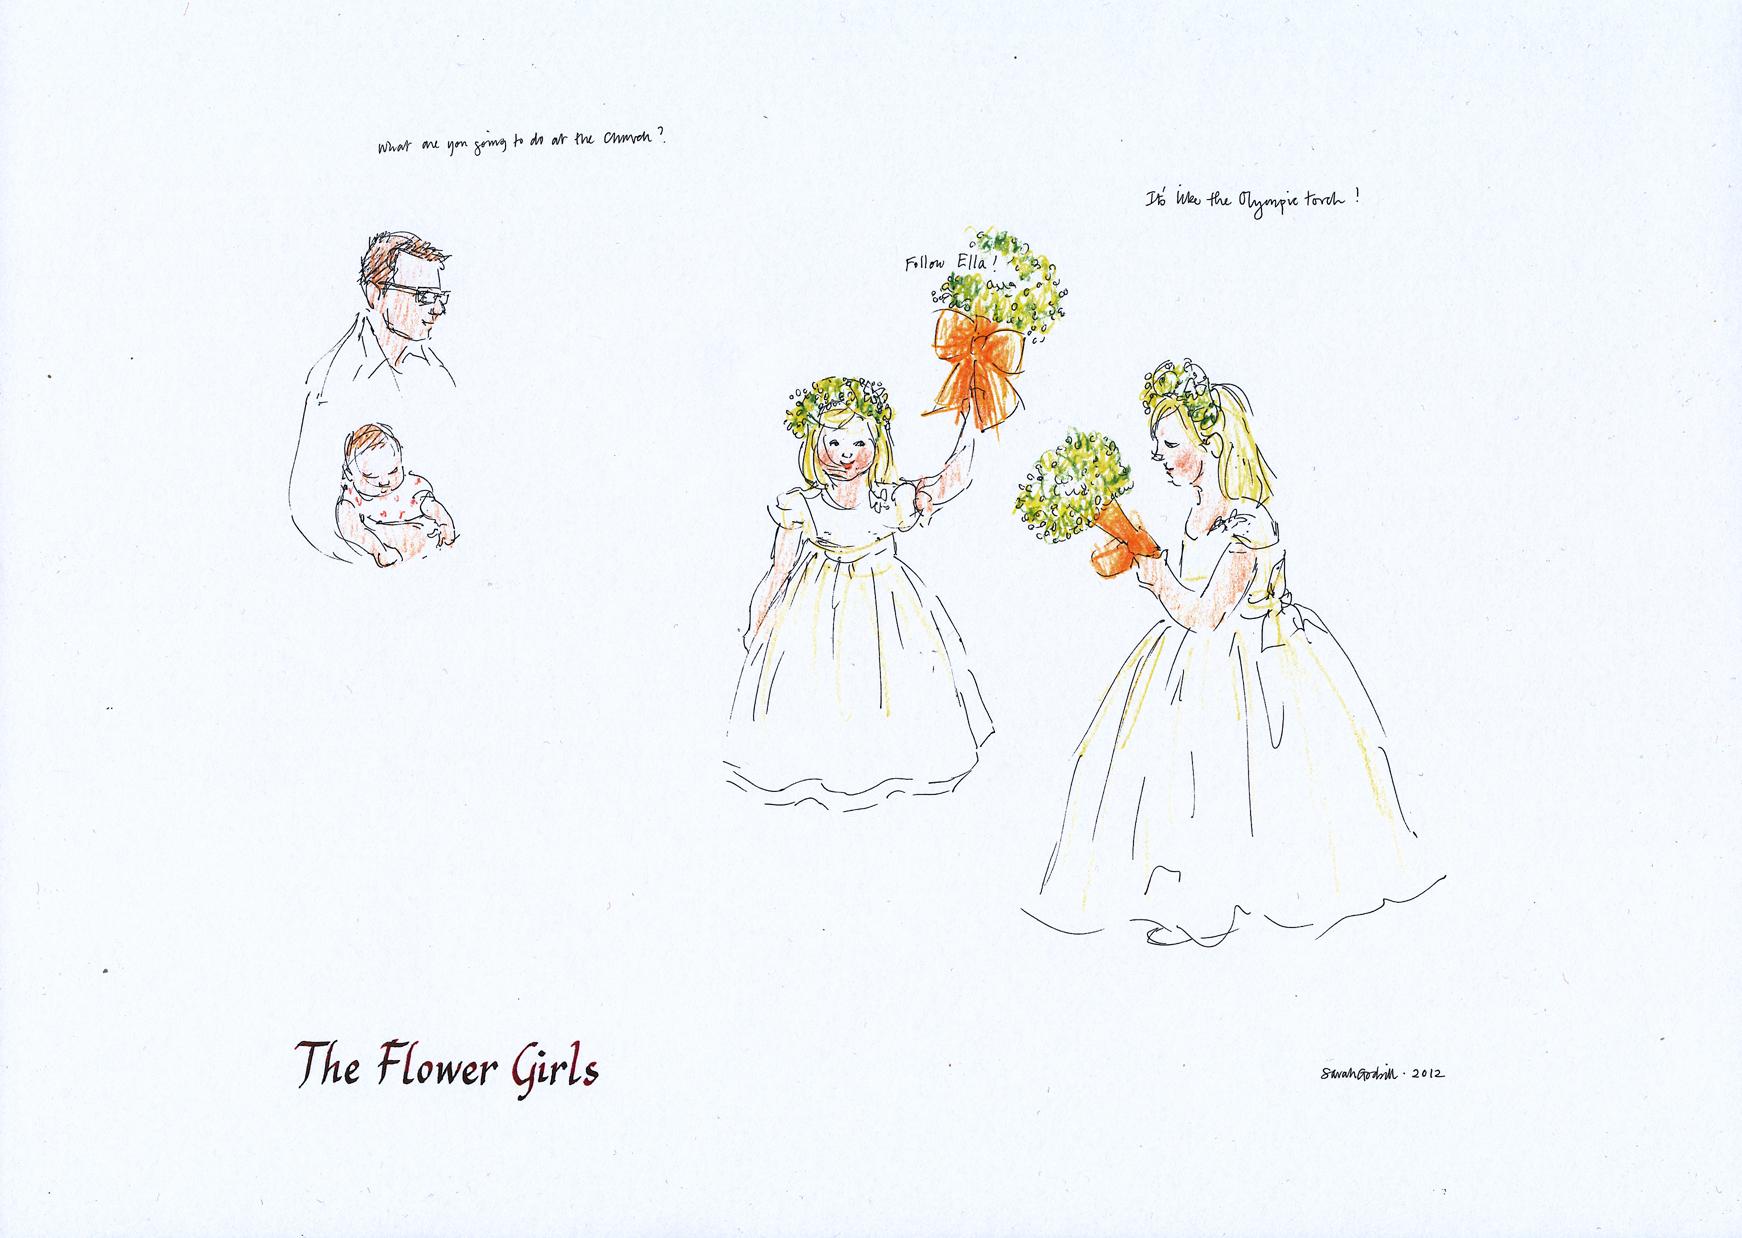 alex-and-ella-flower-girls